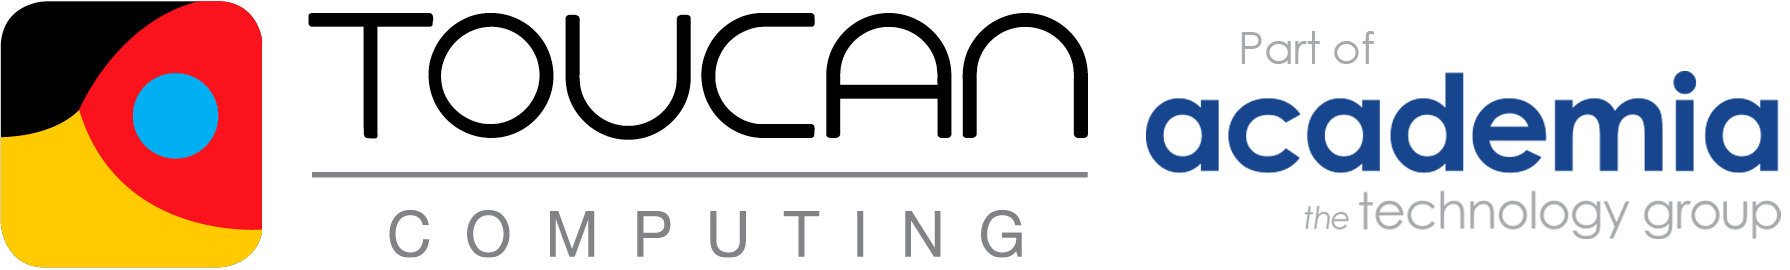 Toucan Computing